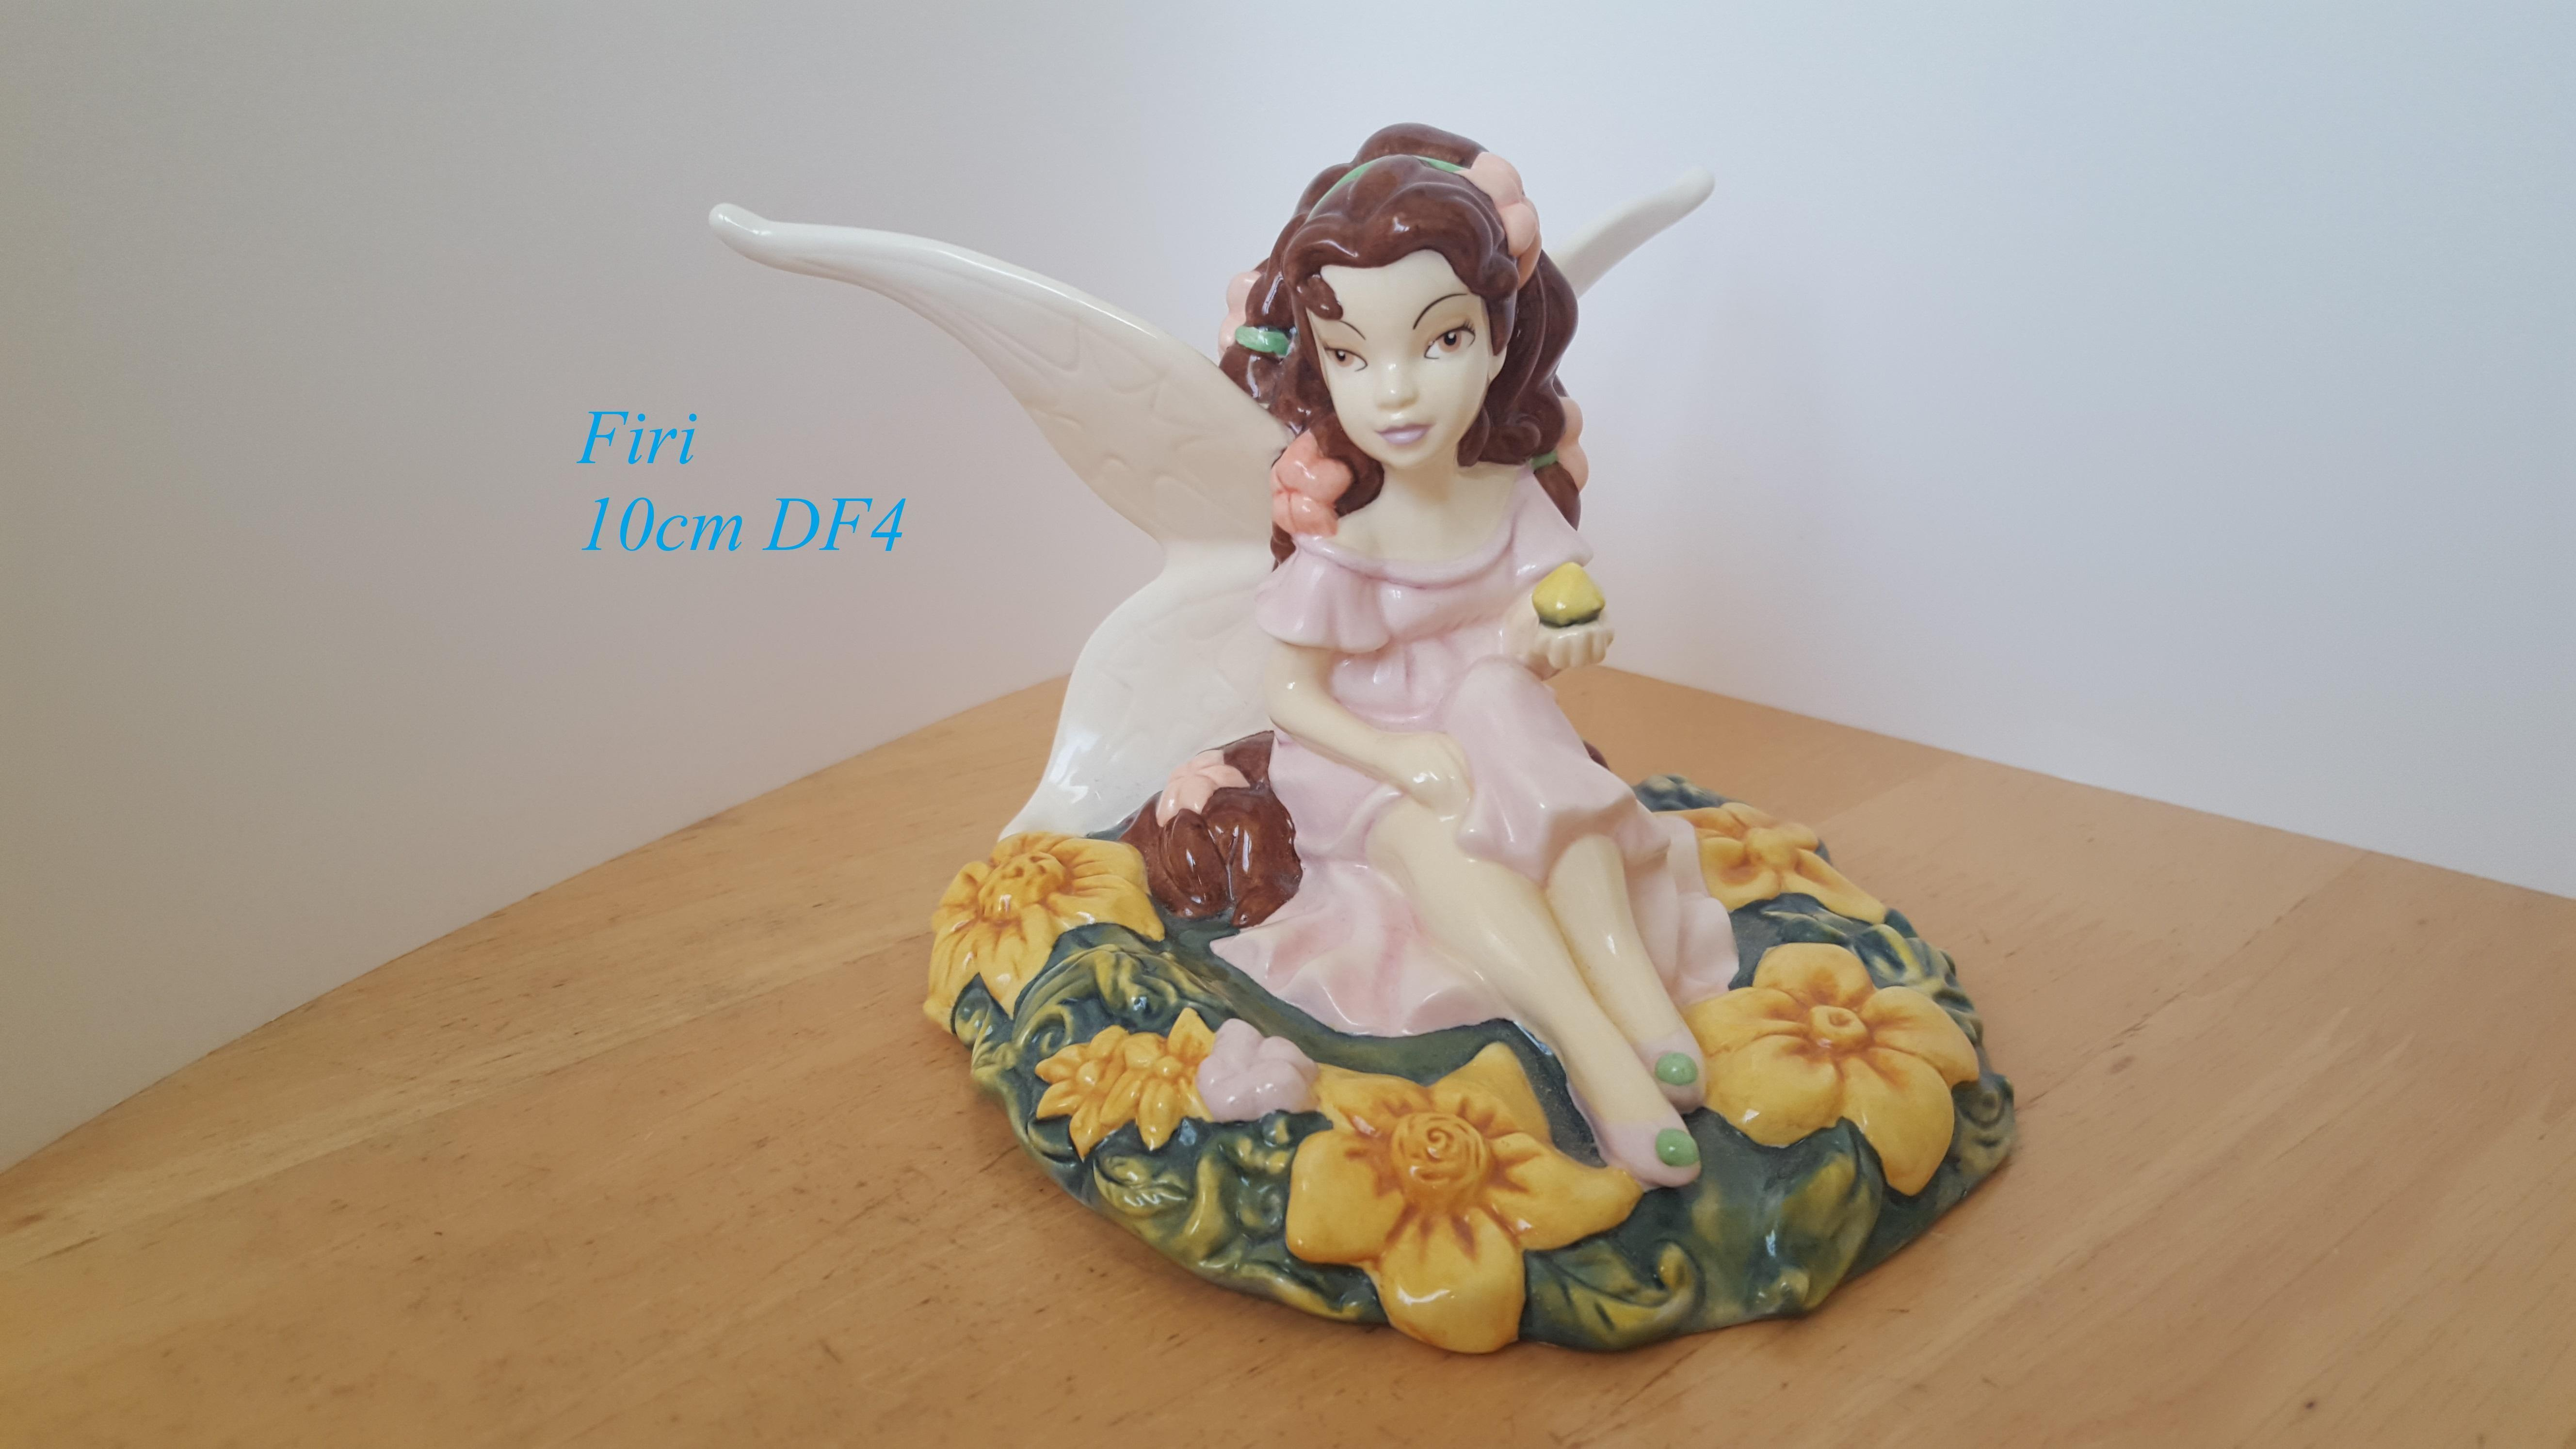 ROYAL DOULTON Disney Fairies Collection Figurine Firi 10cm